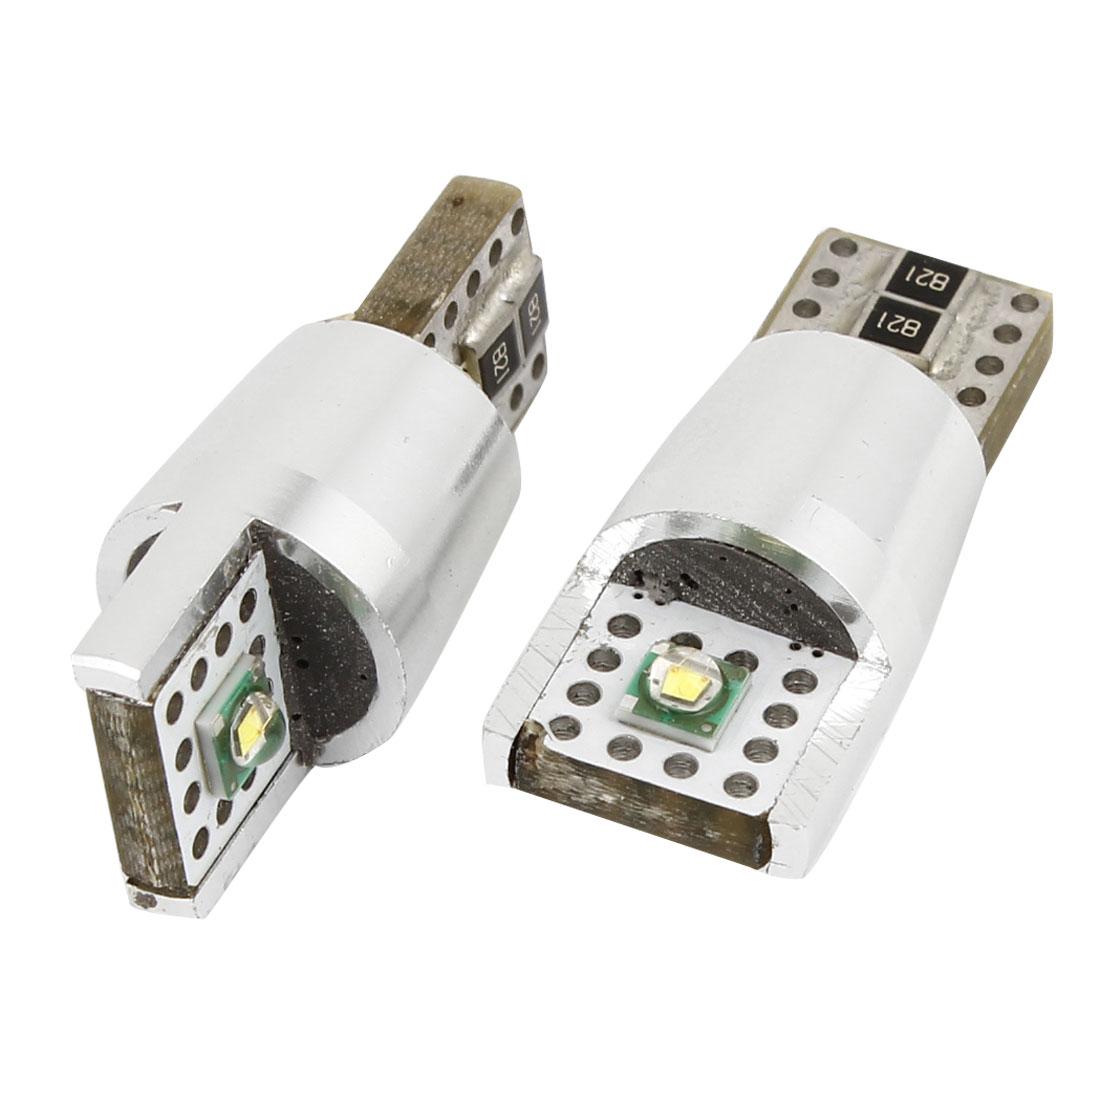 Car Cambus T10 White SMD 2 LED Wedge Light Signal Turn Dash Lamp Bulb 2PCS internal